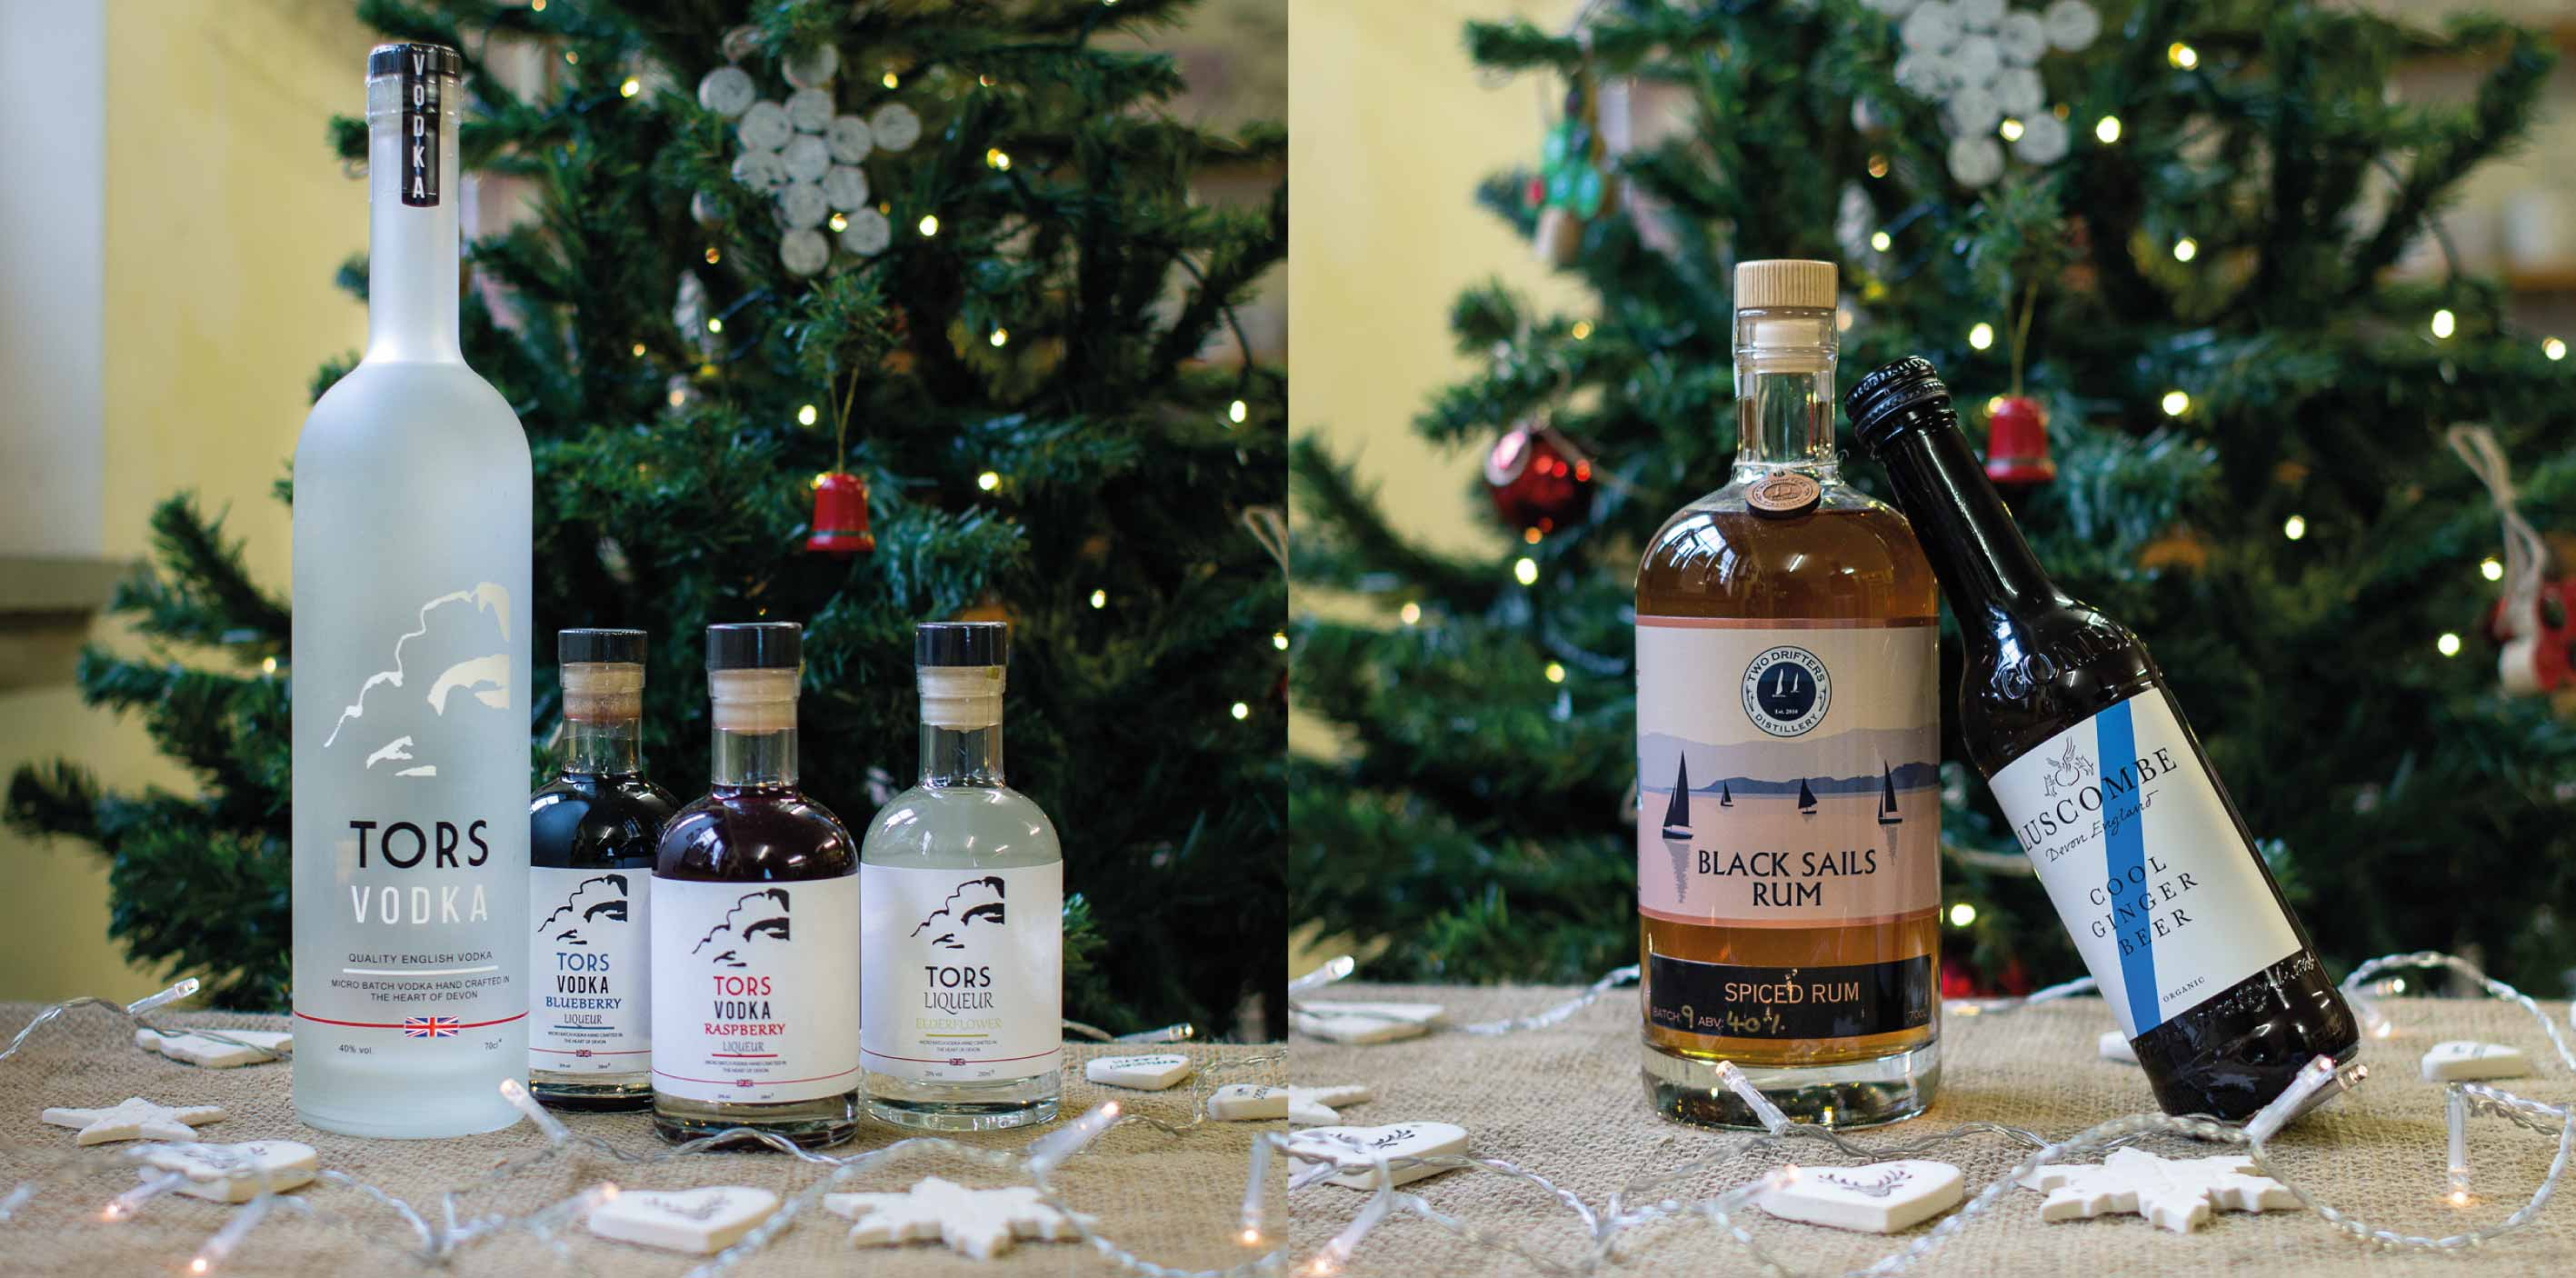 Buy local vodka & rum this Christmas at Alder Vineyard